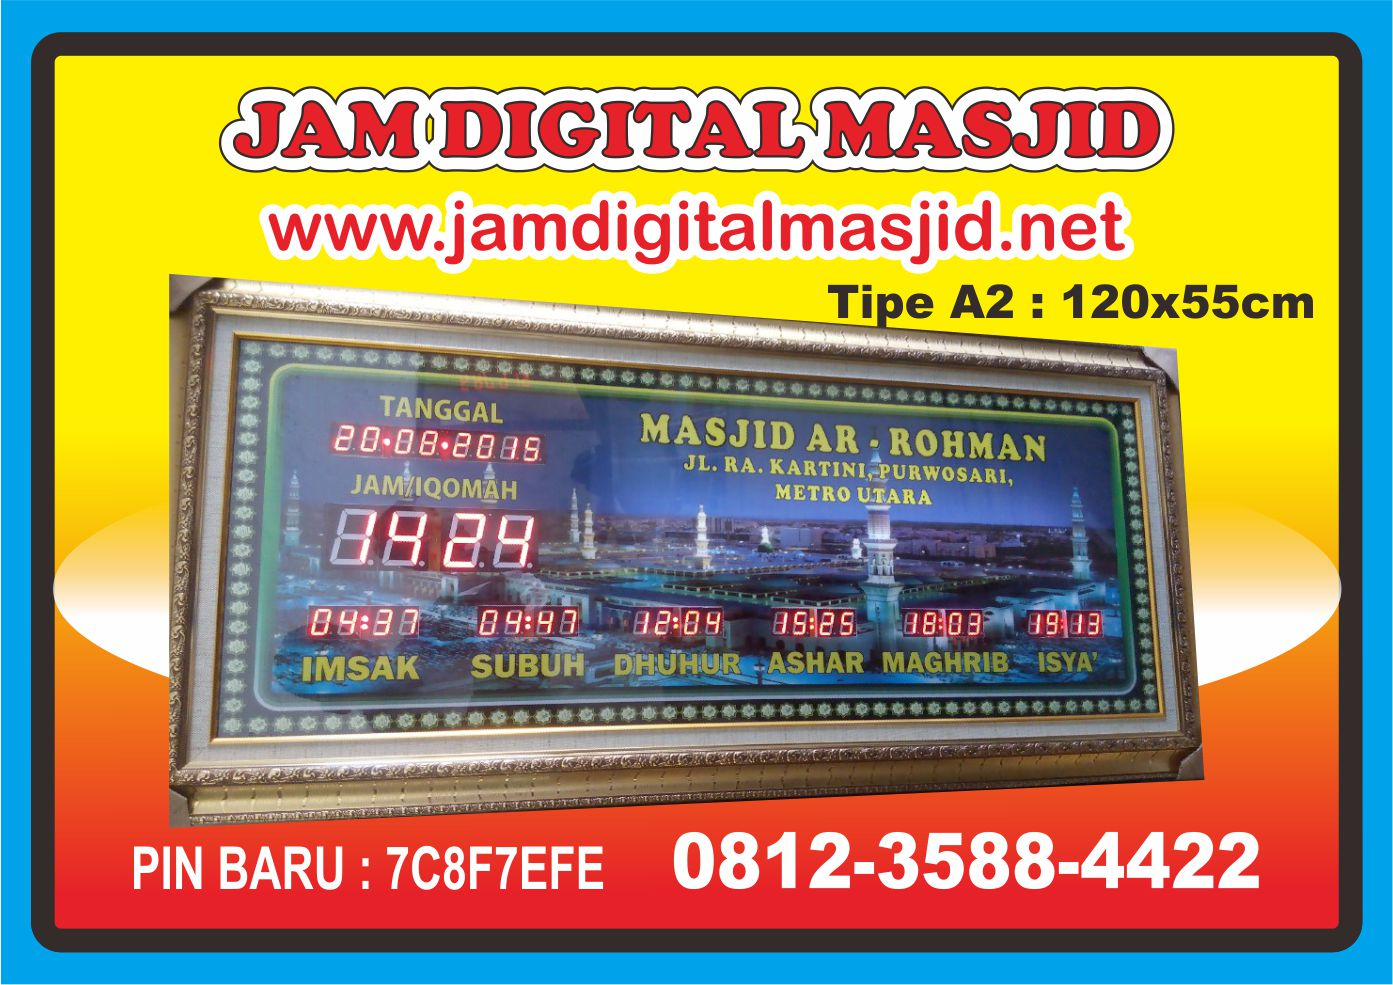 Jam-Digital-Masjid-Jadwal-Sholat-Digital-Produsen-Jual-tipe-A2-120x55-Masjid-Ar-Rohman-Lampung